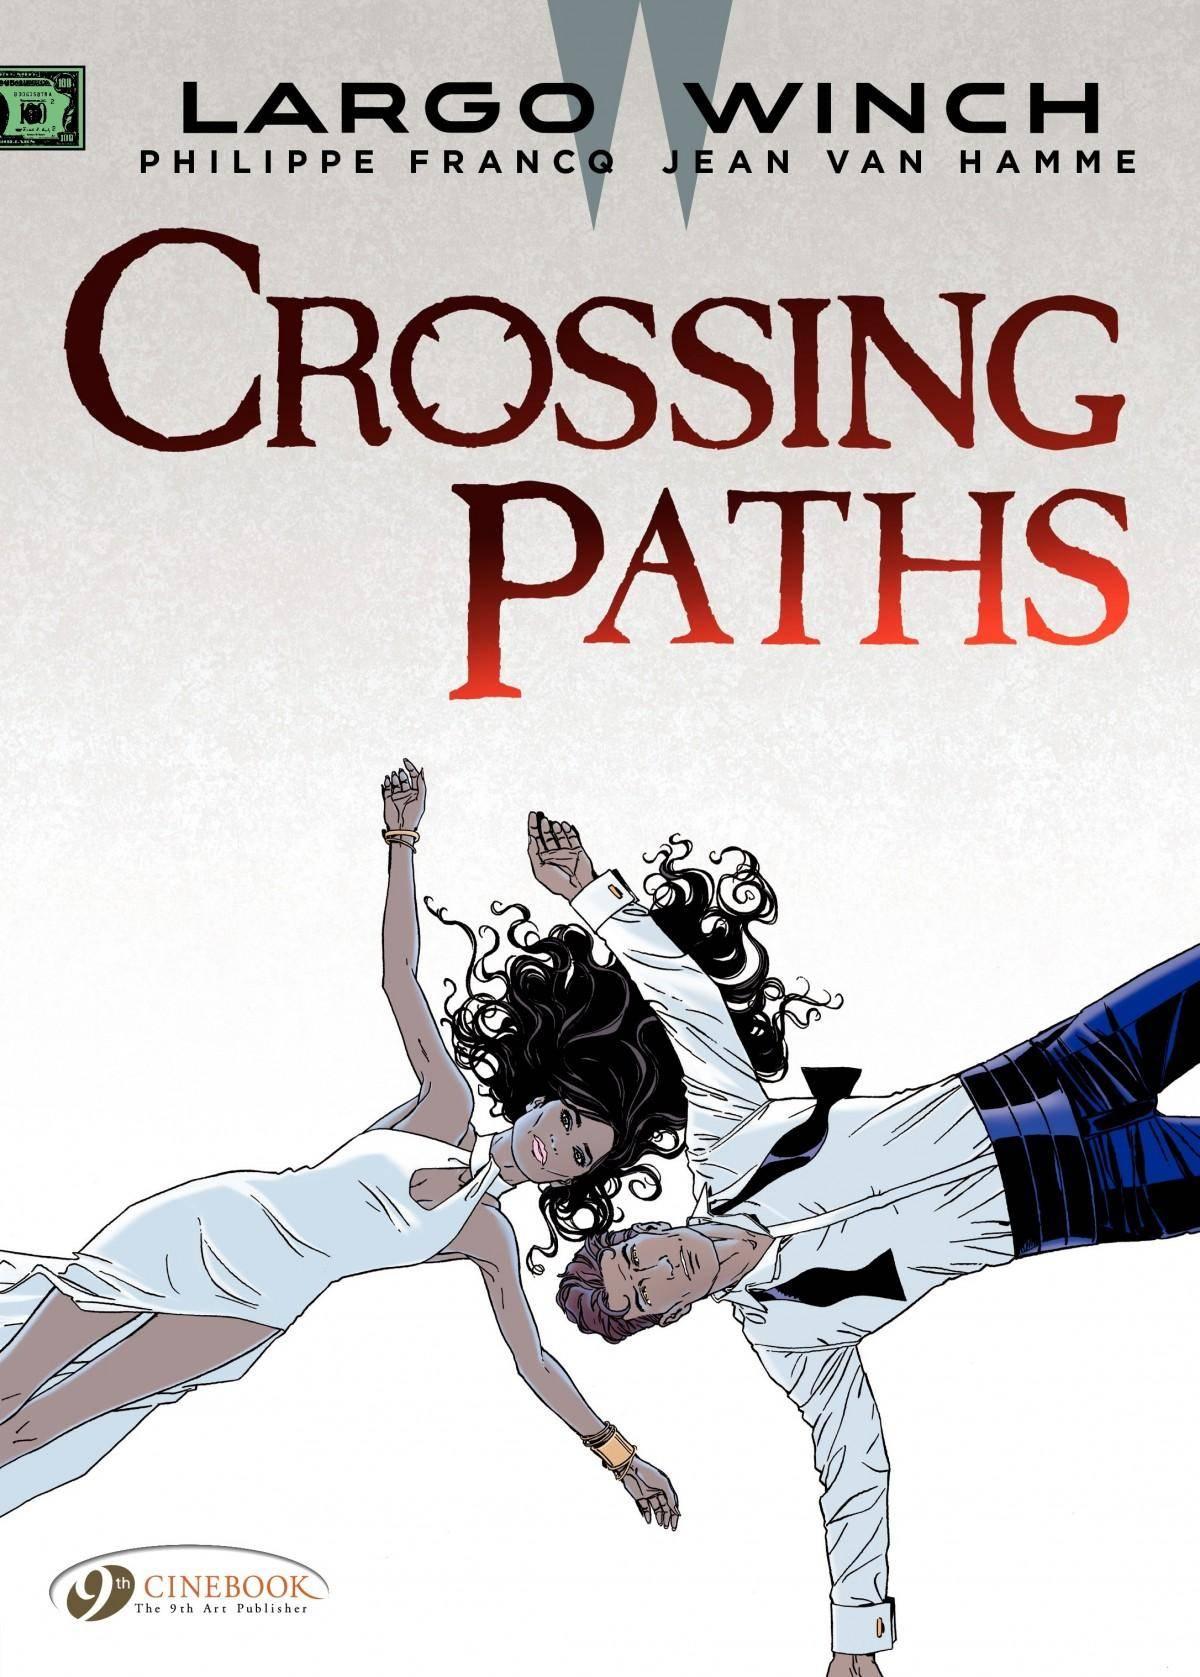 Largo Winch 015 - Crossing Paths 2015 Cinebook digital